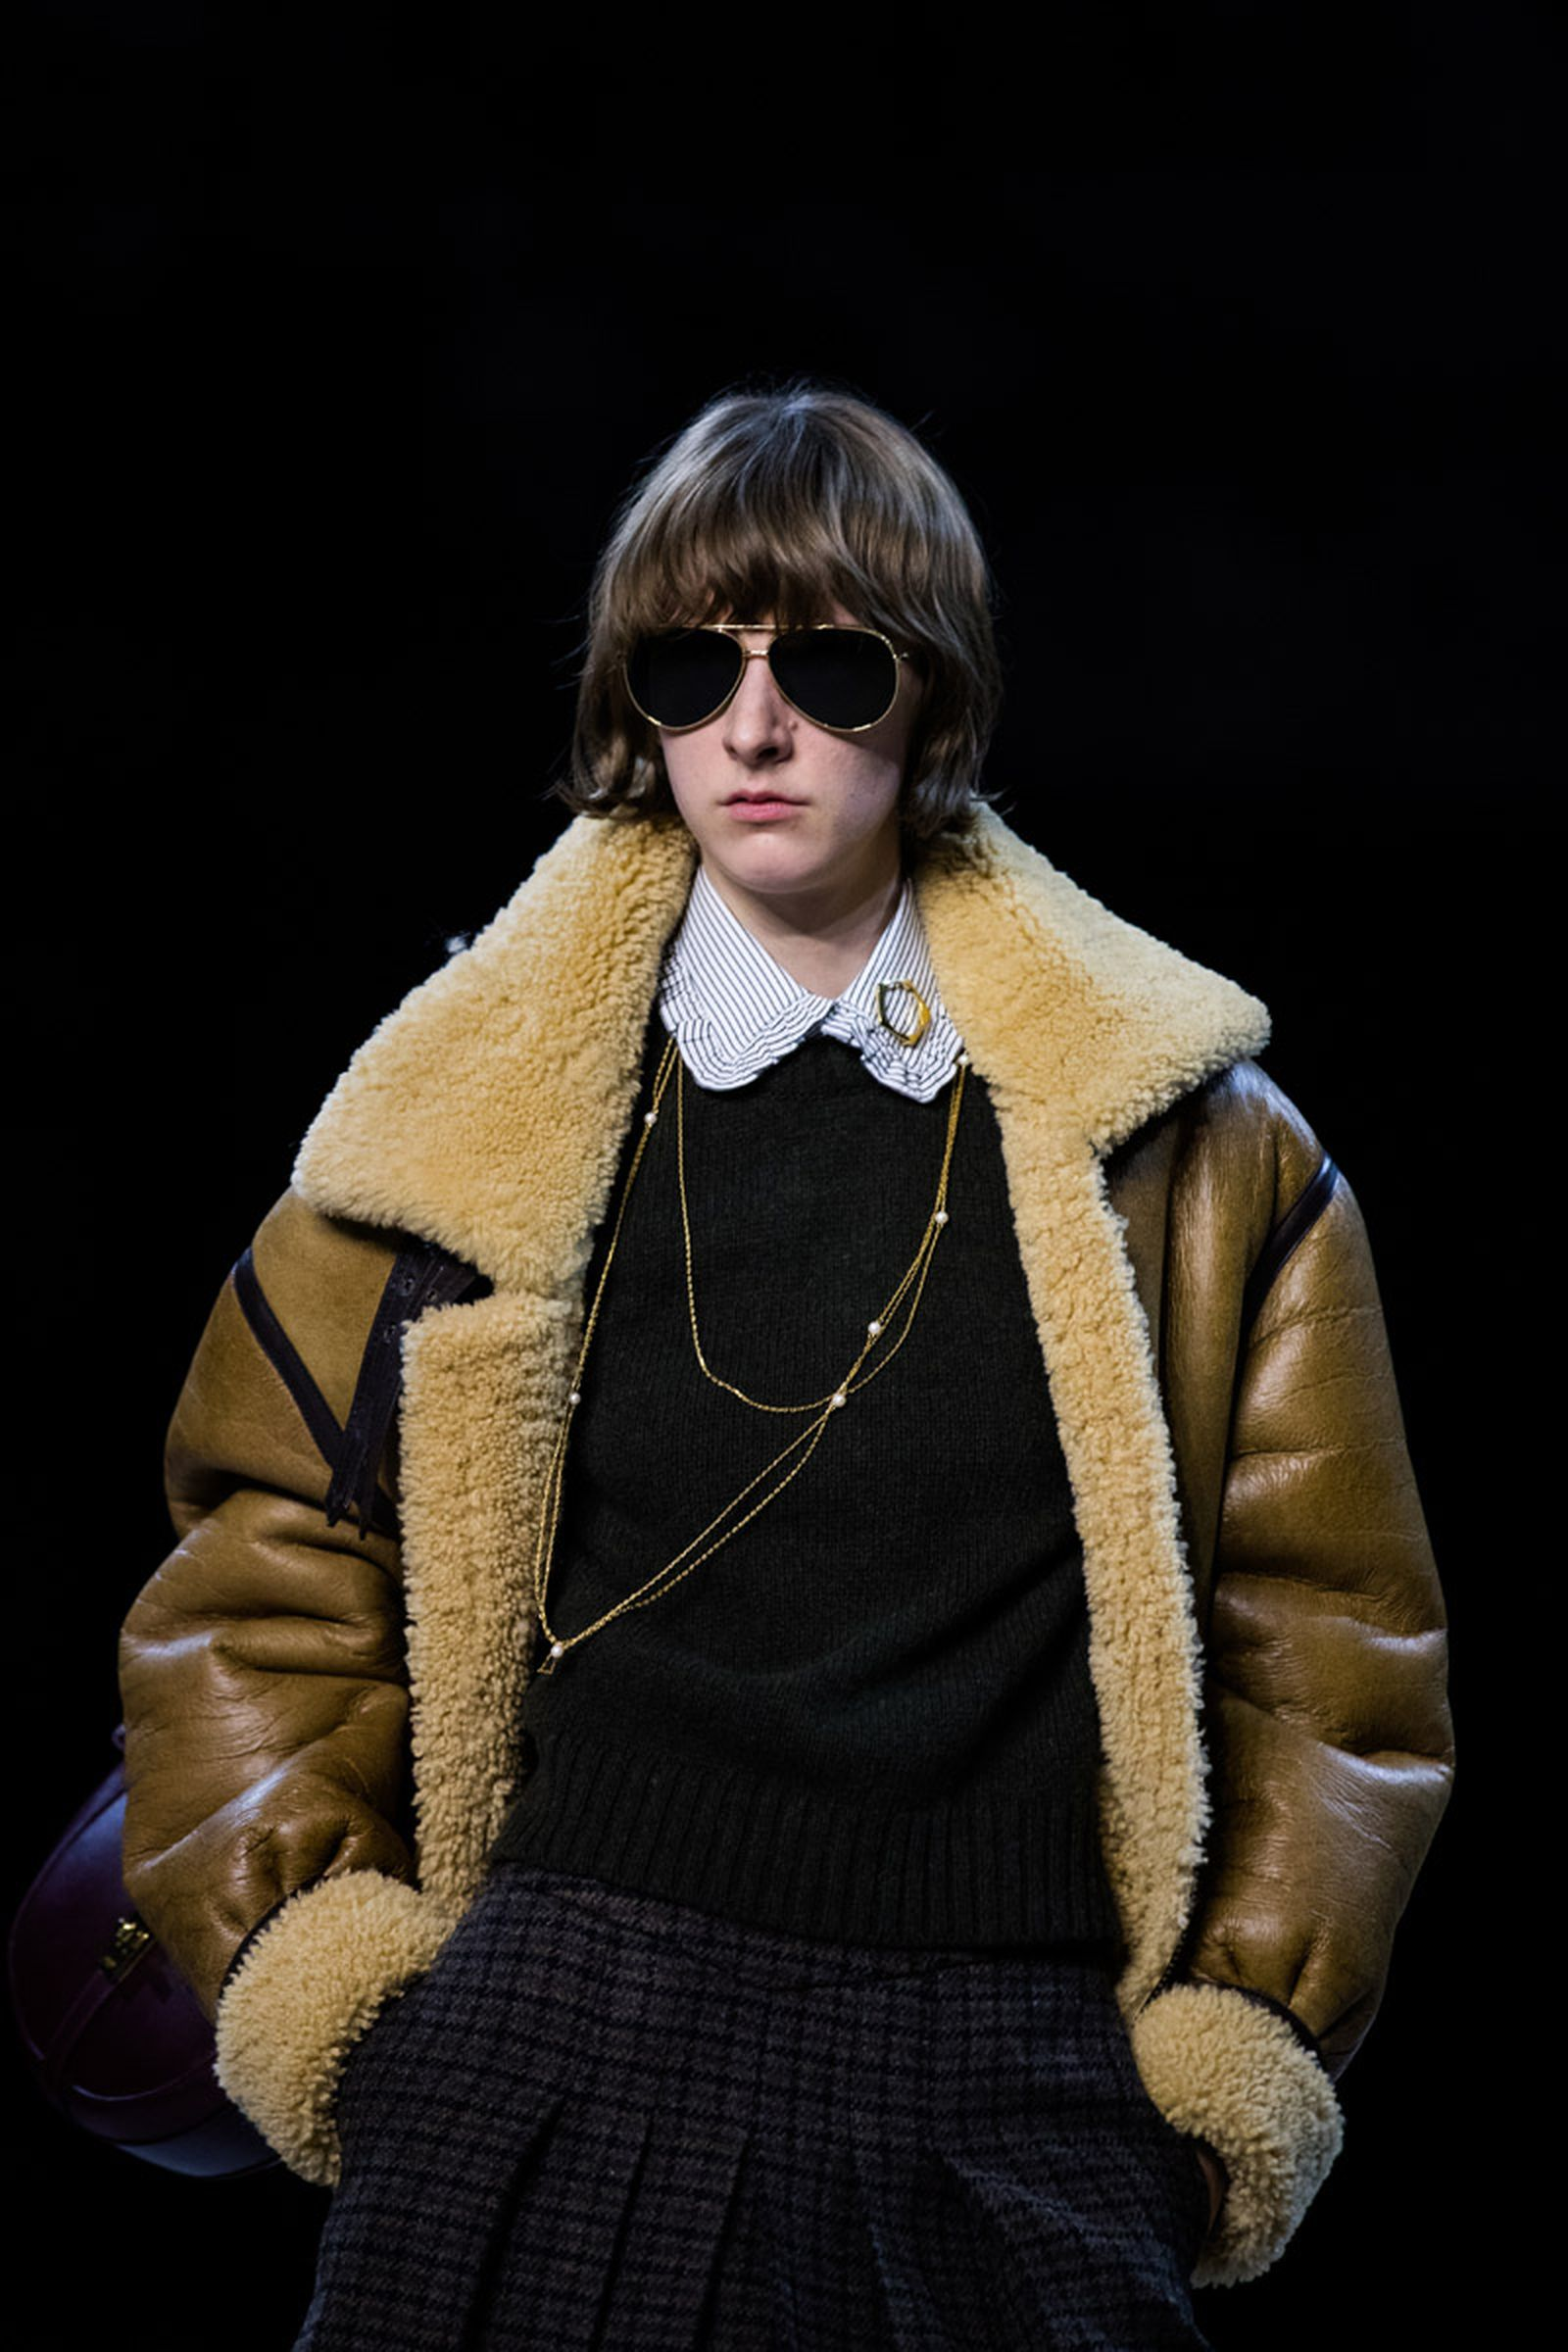 1celine fw19 womens paris fashion week